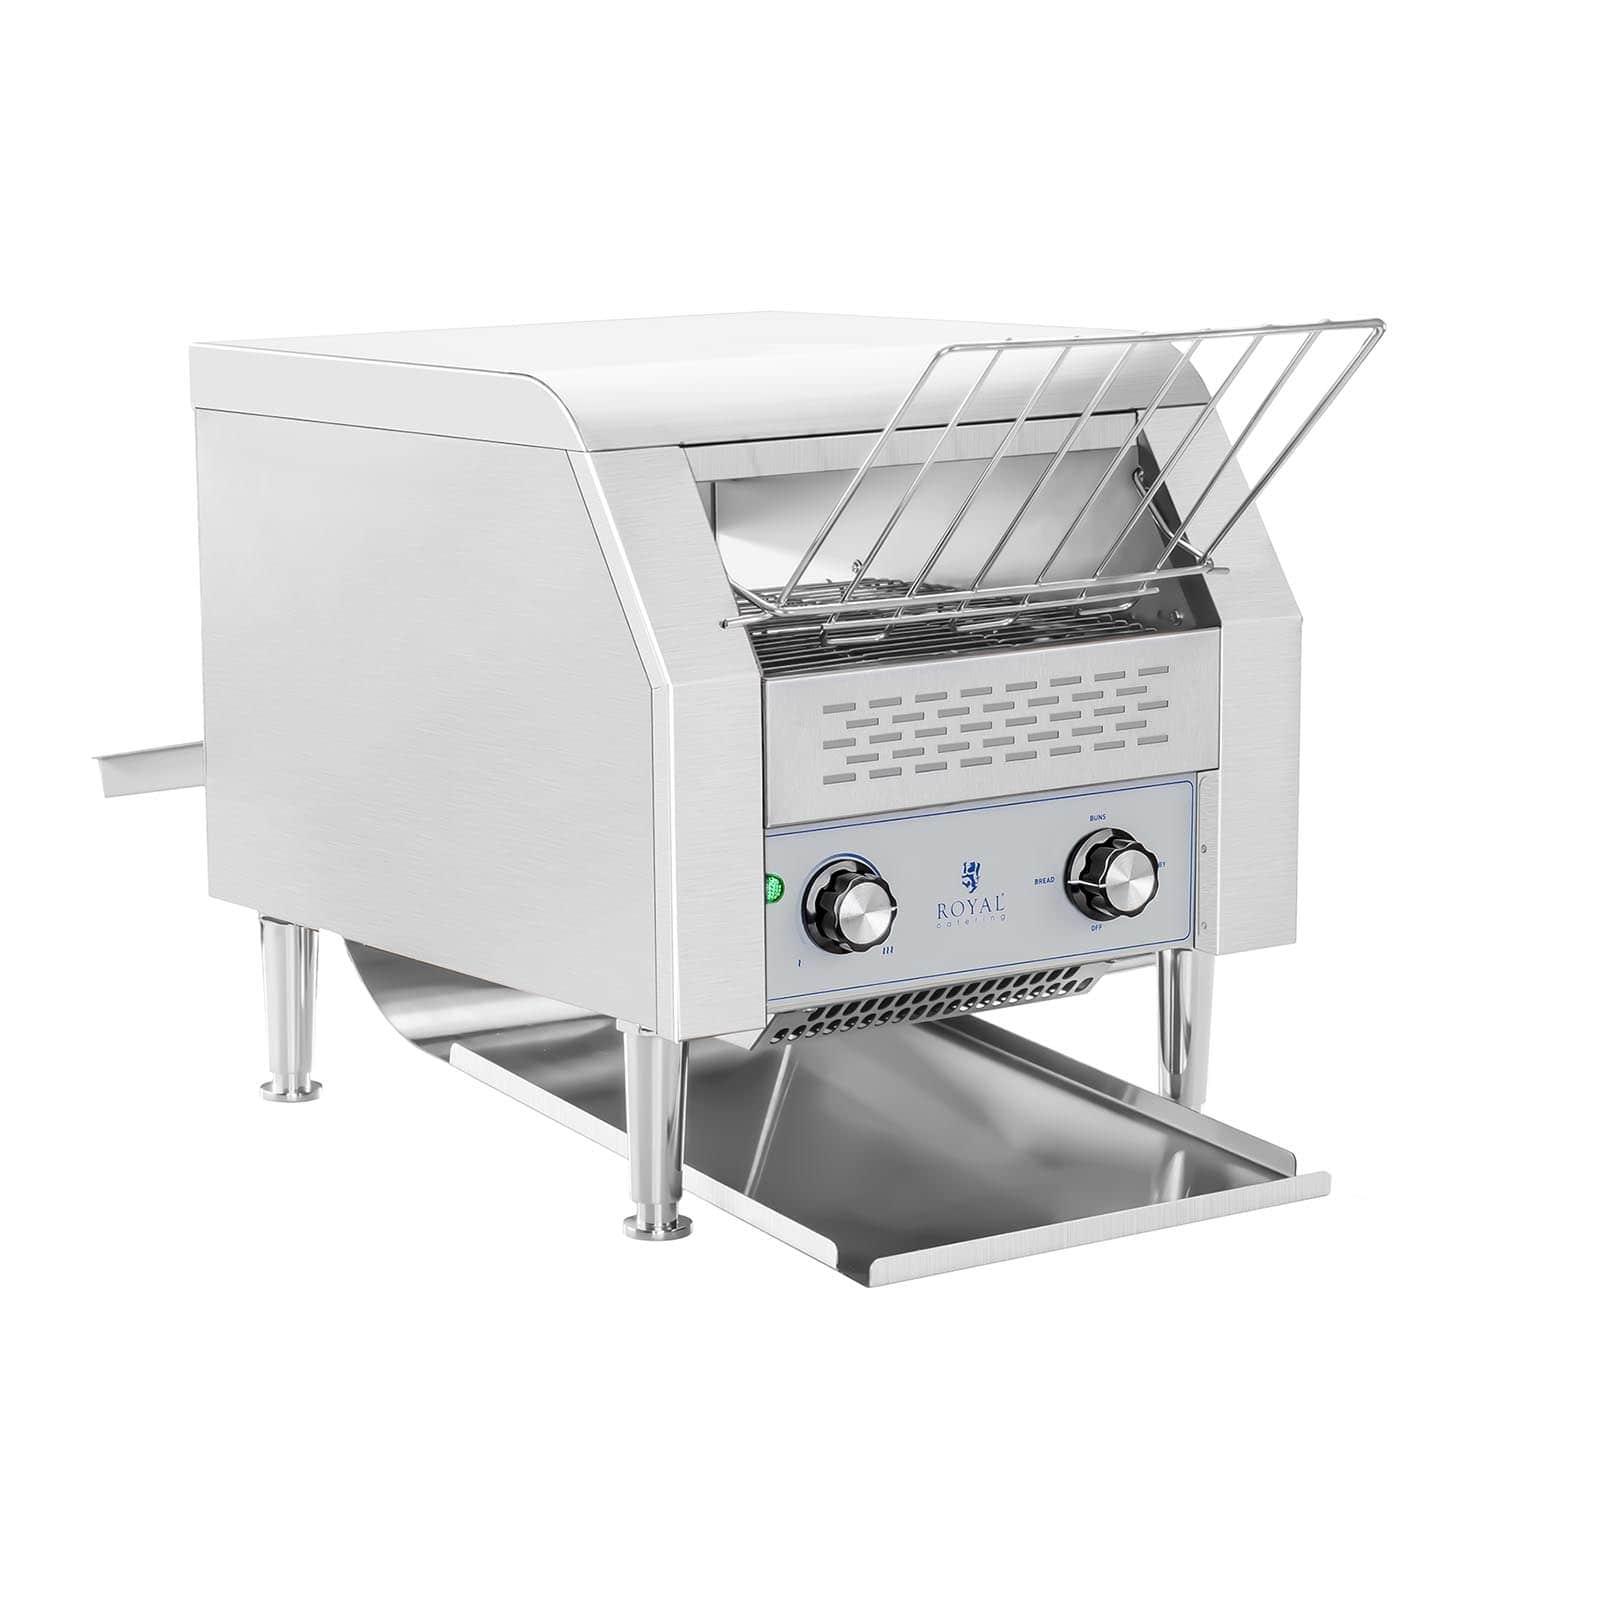 Gastro Toaster